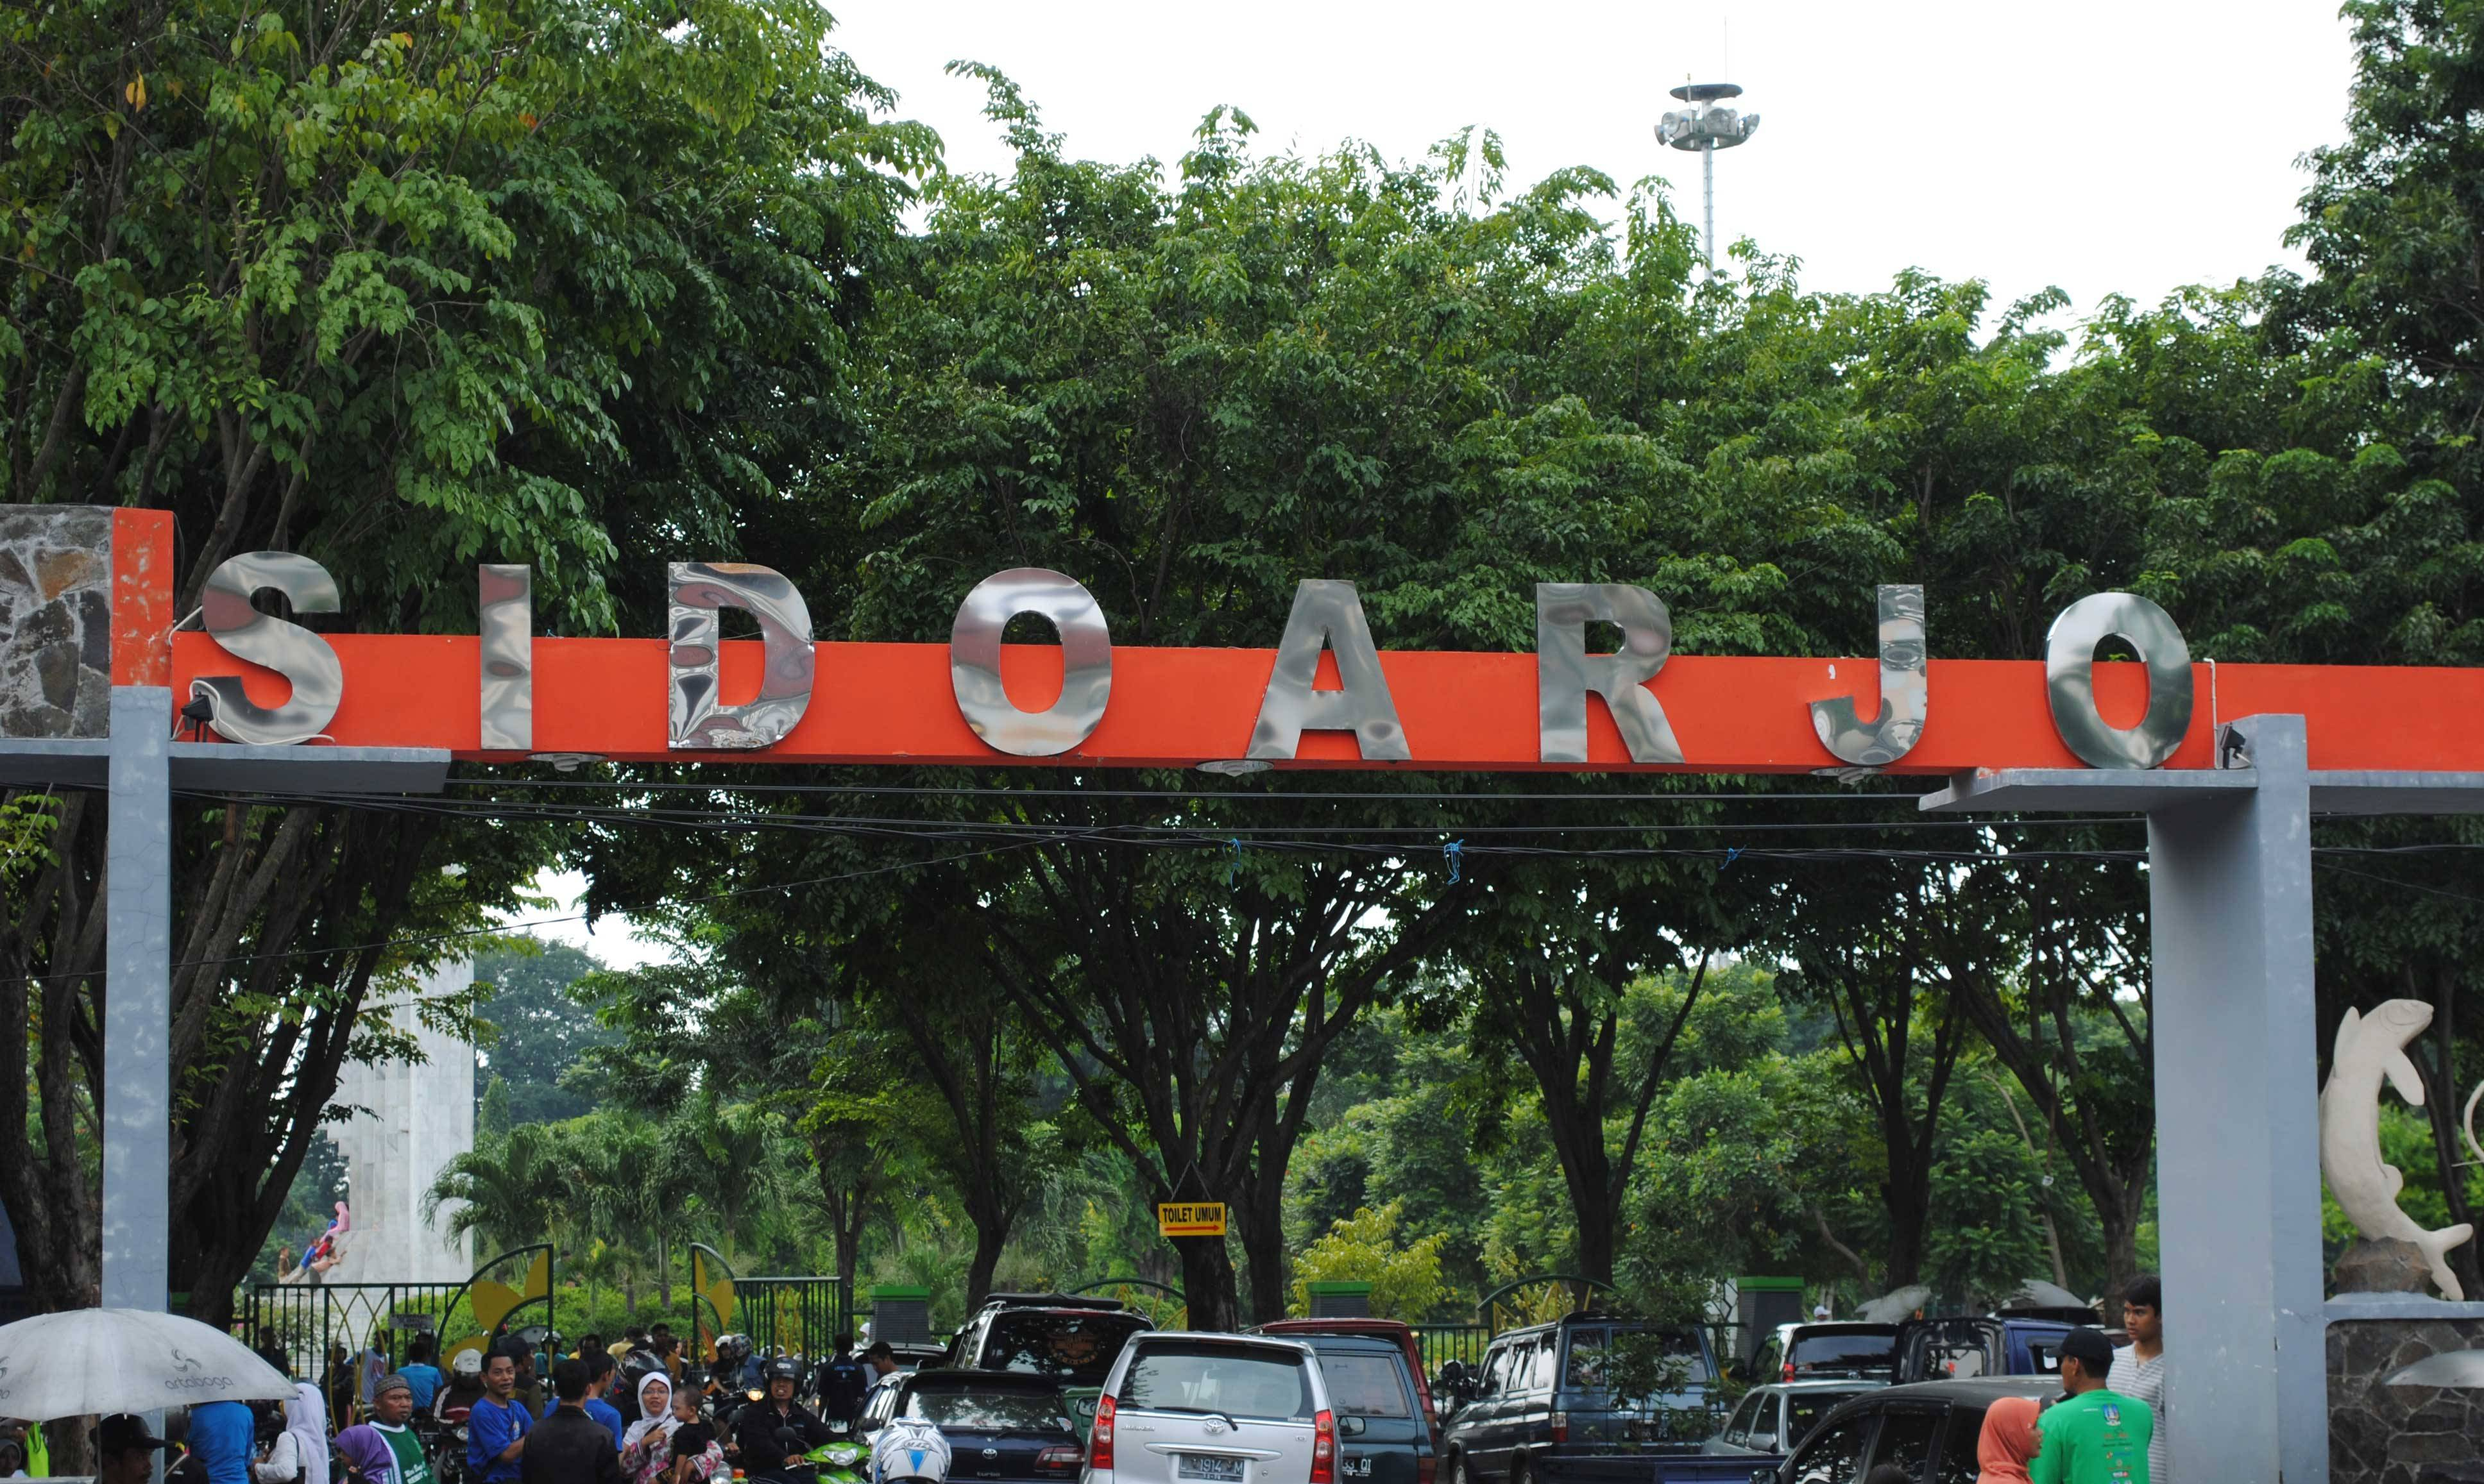 Sidoarjo Jpg Wisata Sentra Produksi Tas Tanggulangin Kab